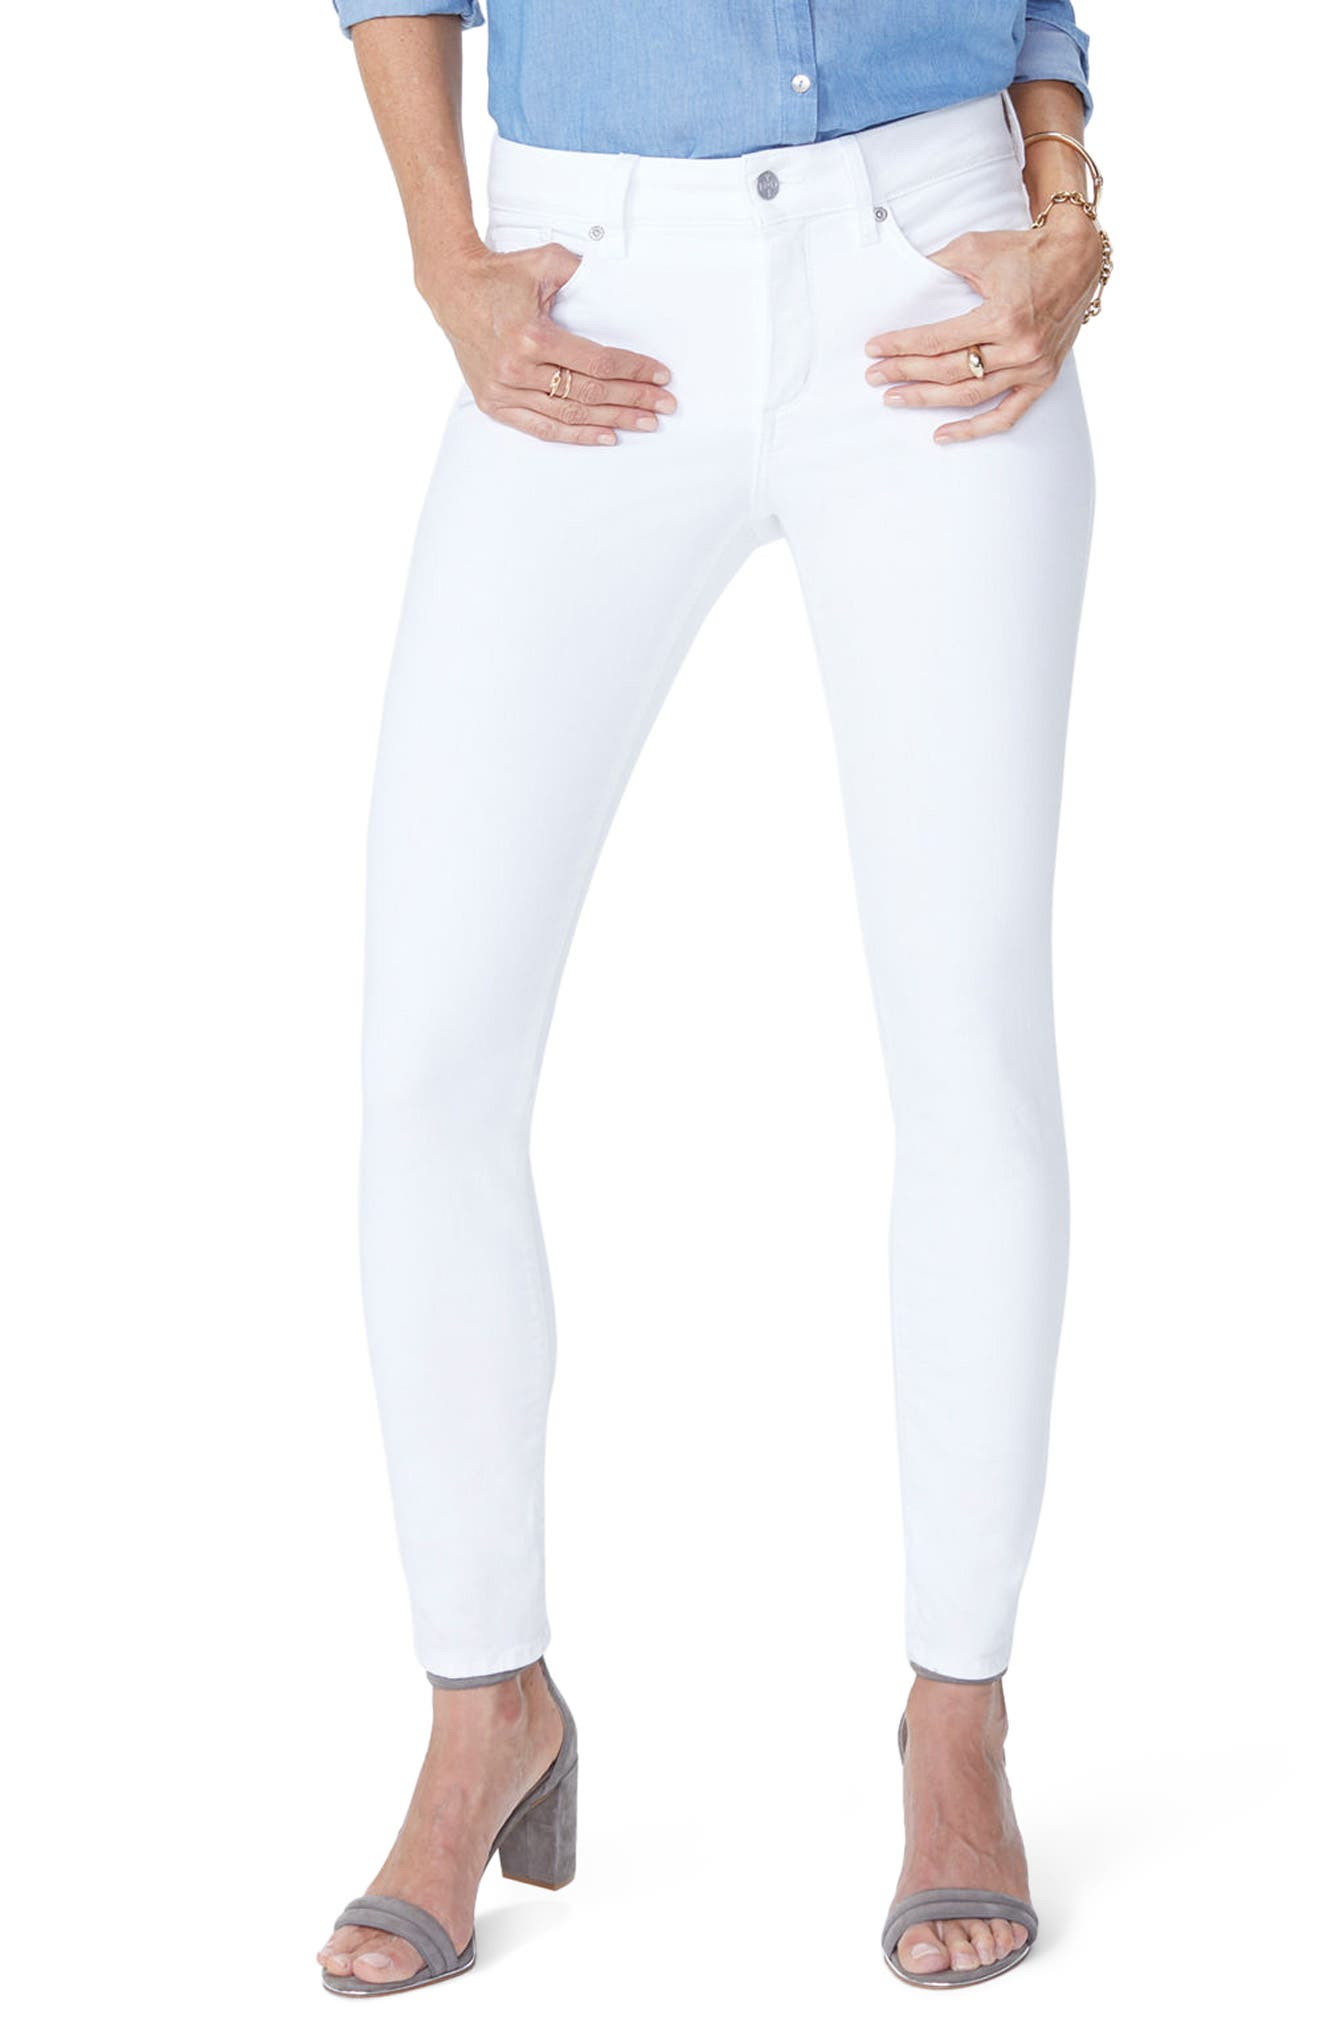 Ami Skinny Jeans,                         Main,                         color, Optic White